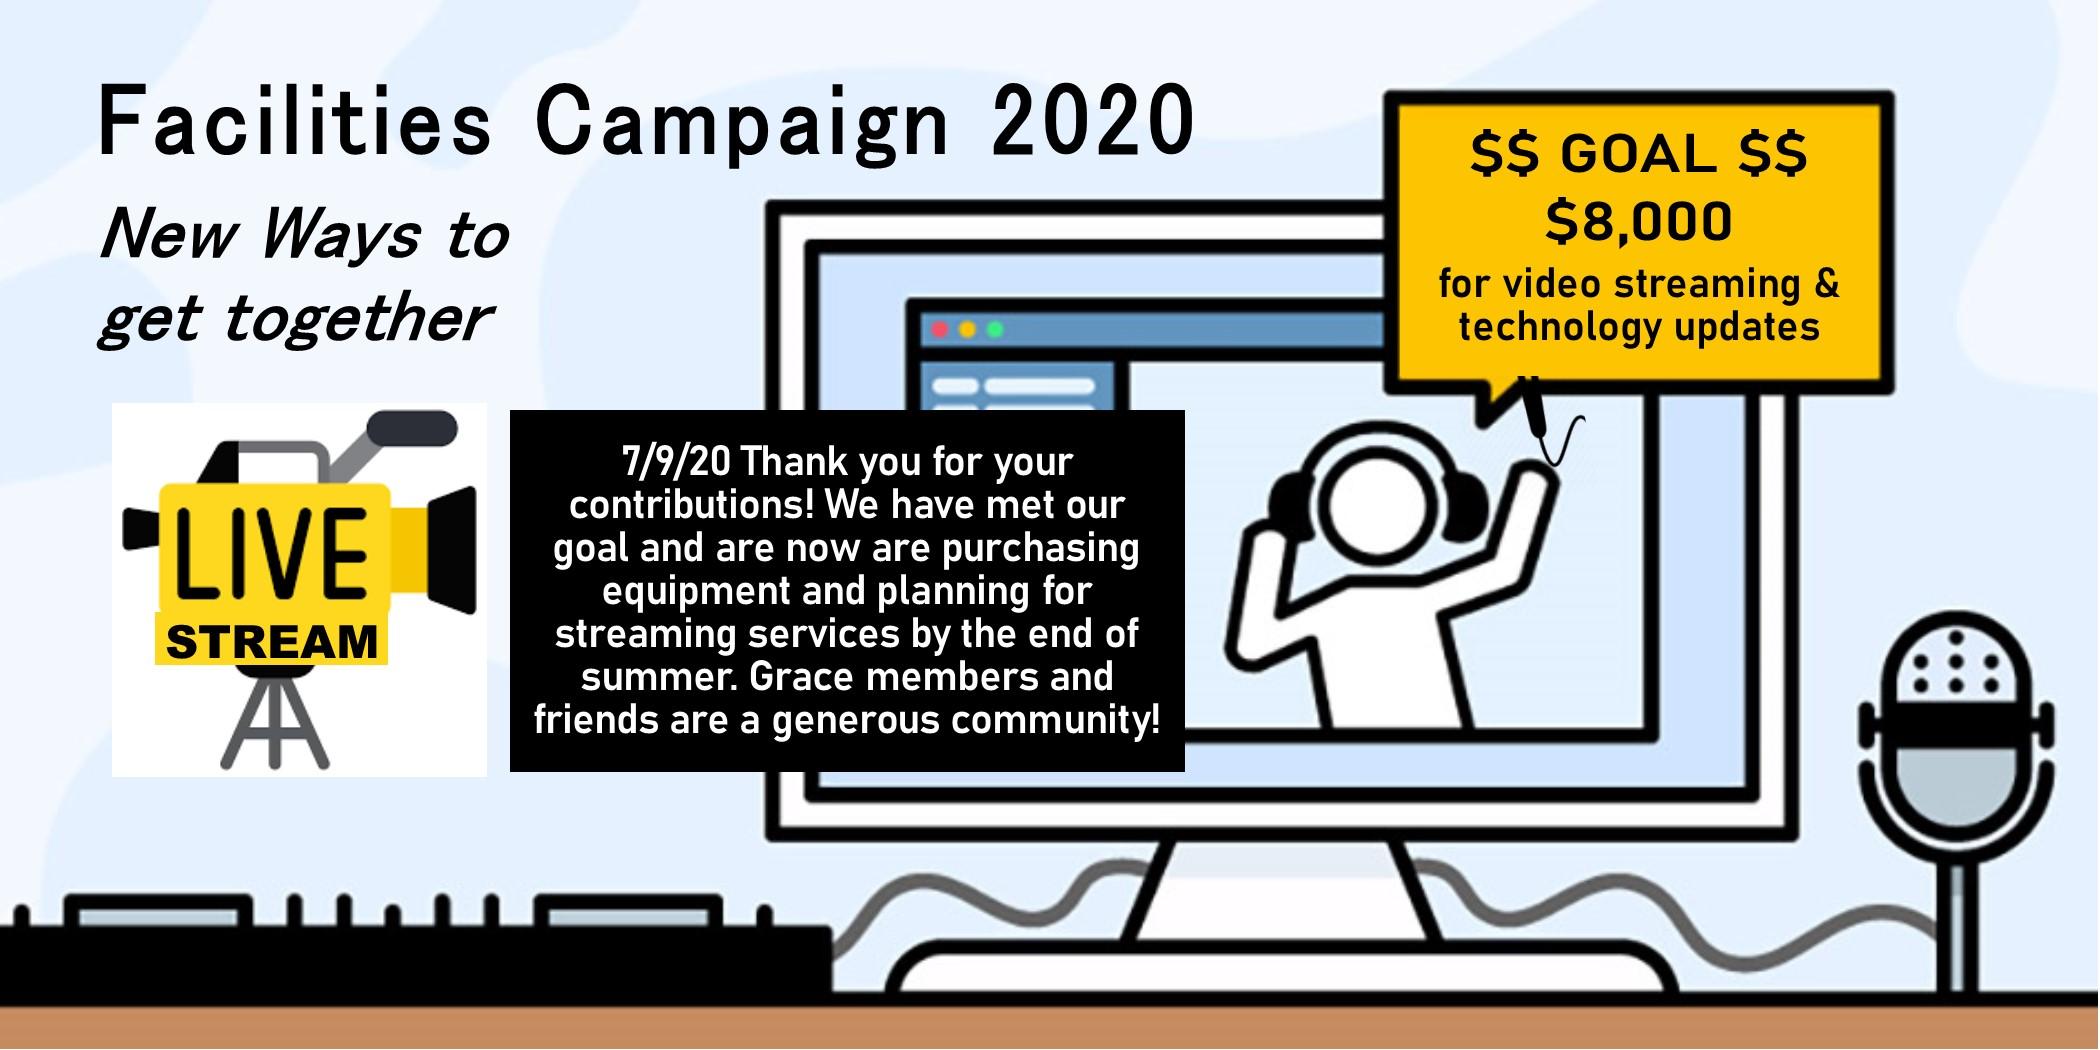 2020 6 Facilities Campaign 2